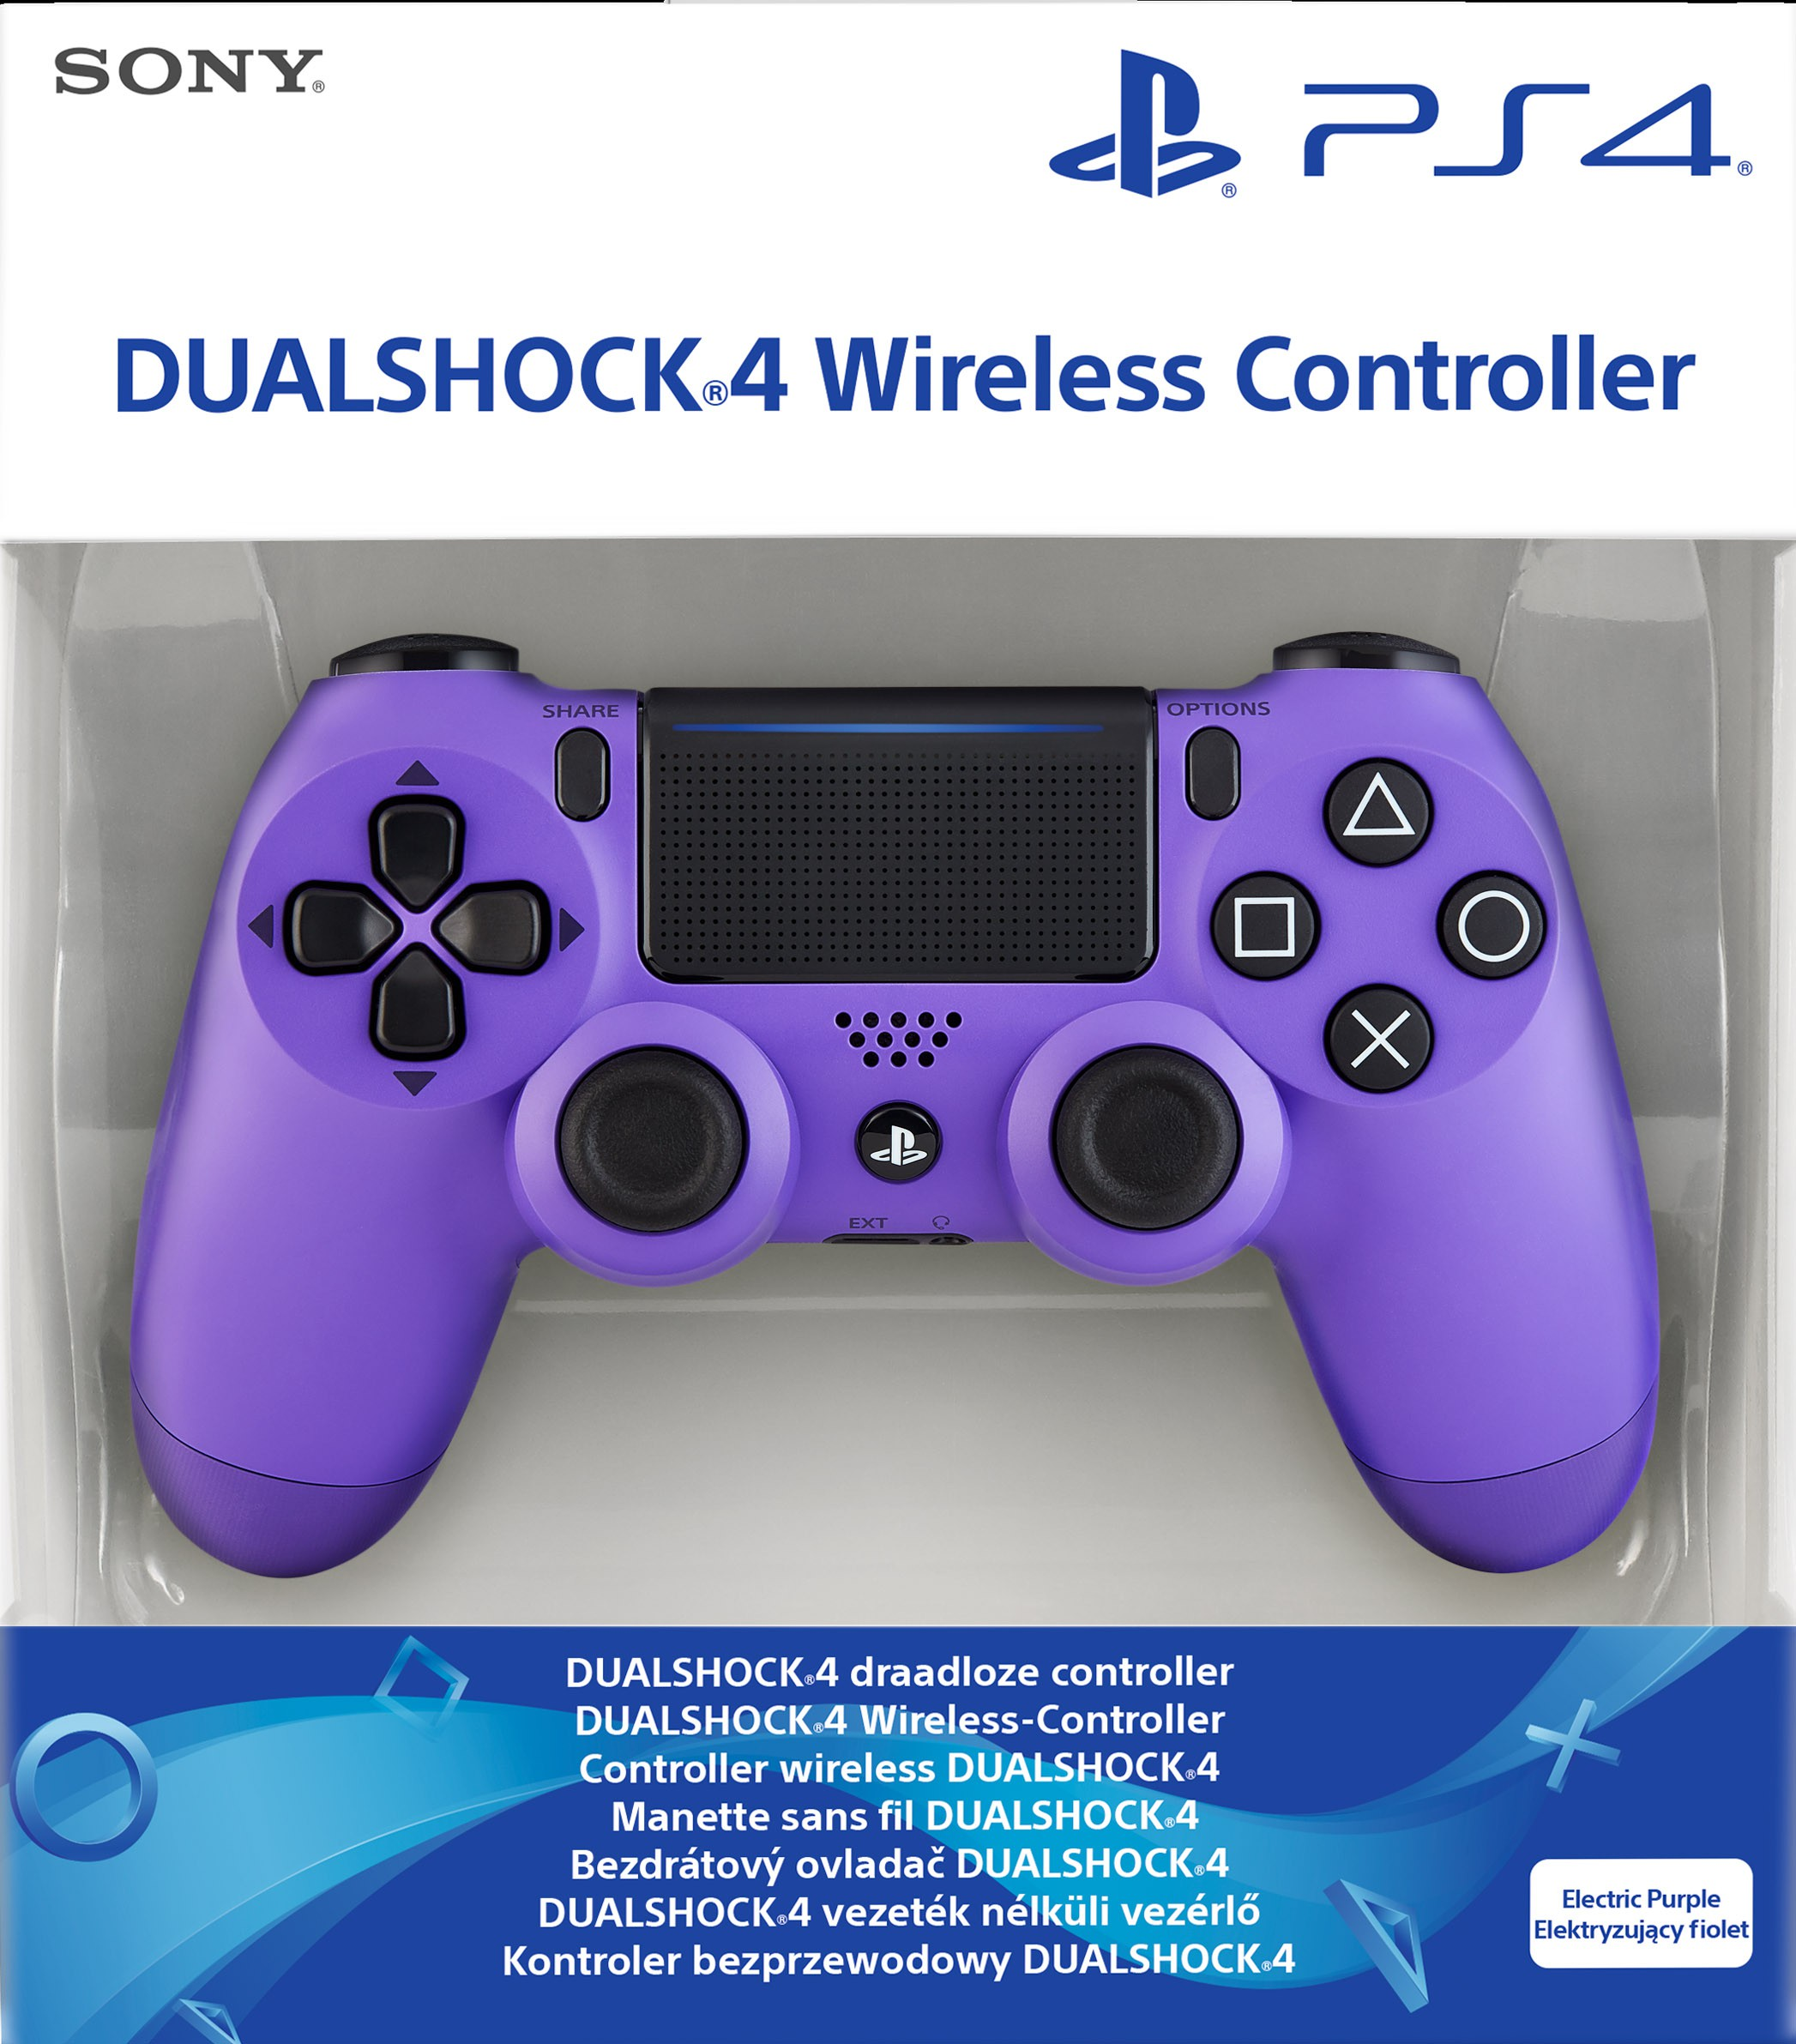 Sony PlayStation DualShock 4 V2 Controller - Electric Purple